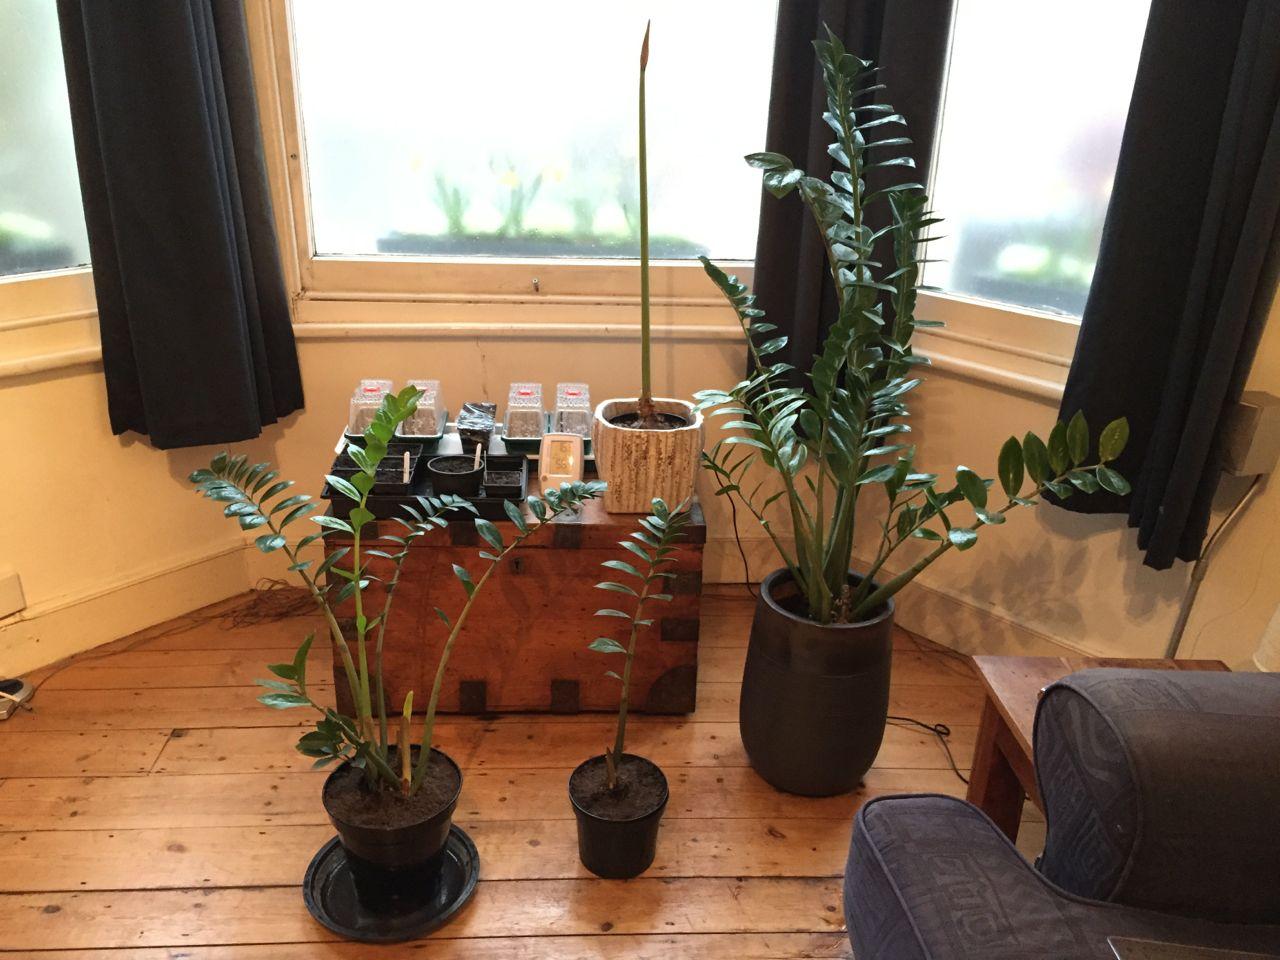 Dividing A Zamioculcas Zamiifolia Zz Plant Jack Wallington Garden Design Ltd